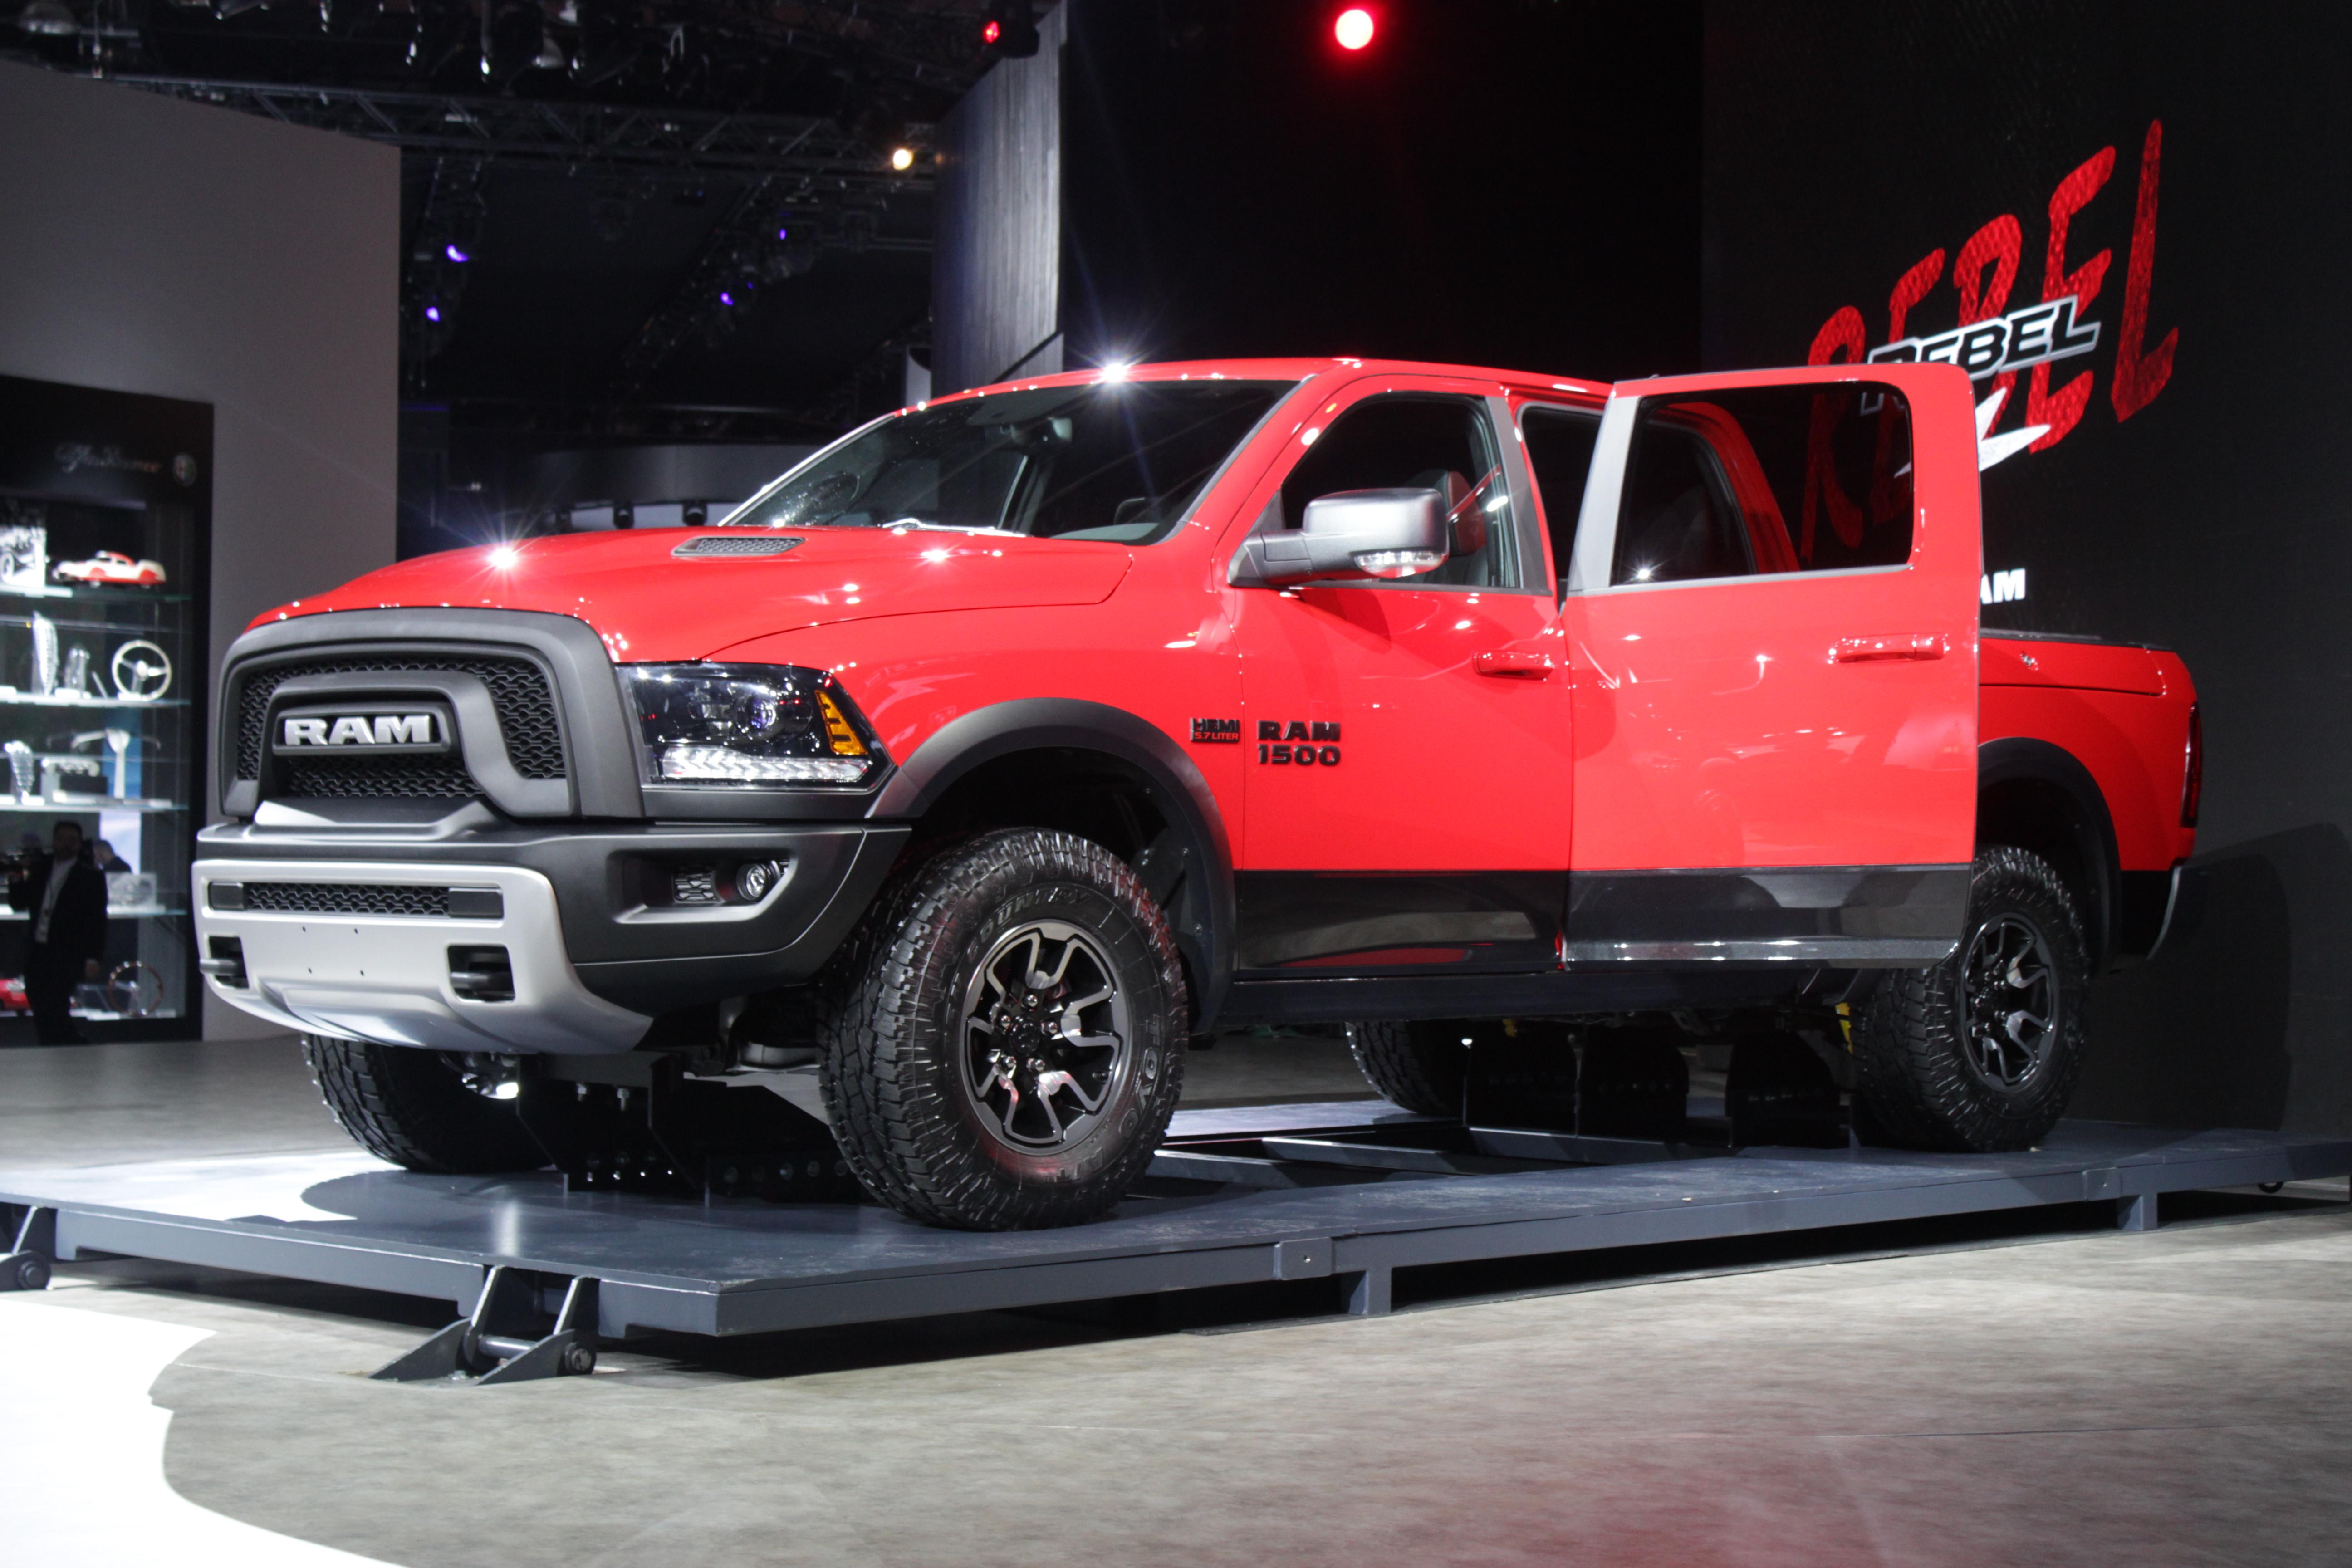 2015-Ram-1500-Rebel-Detroit-Auto-Show